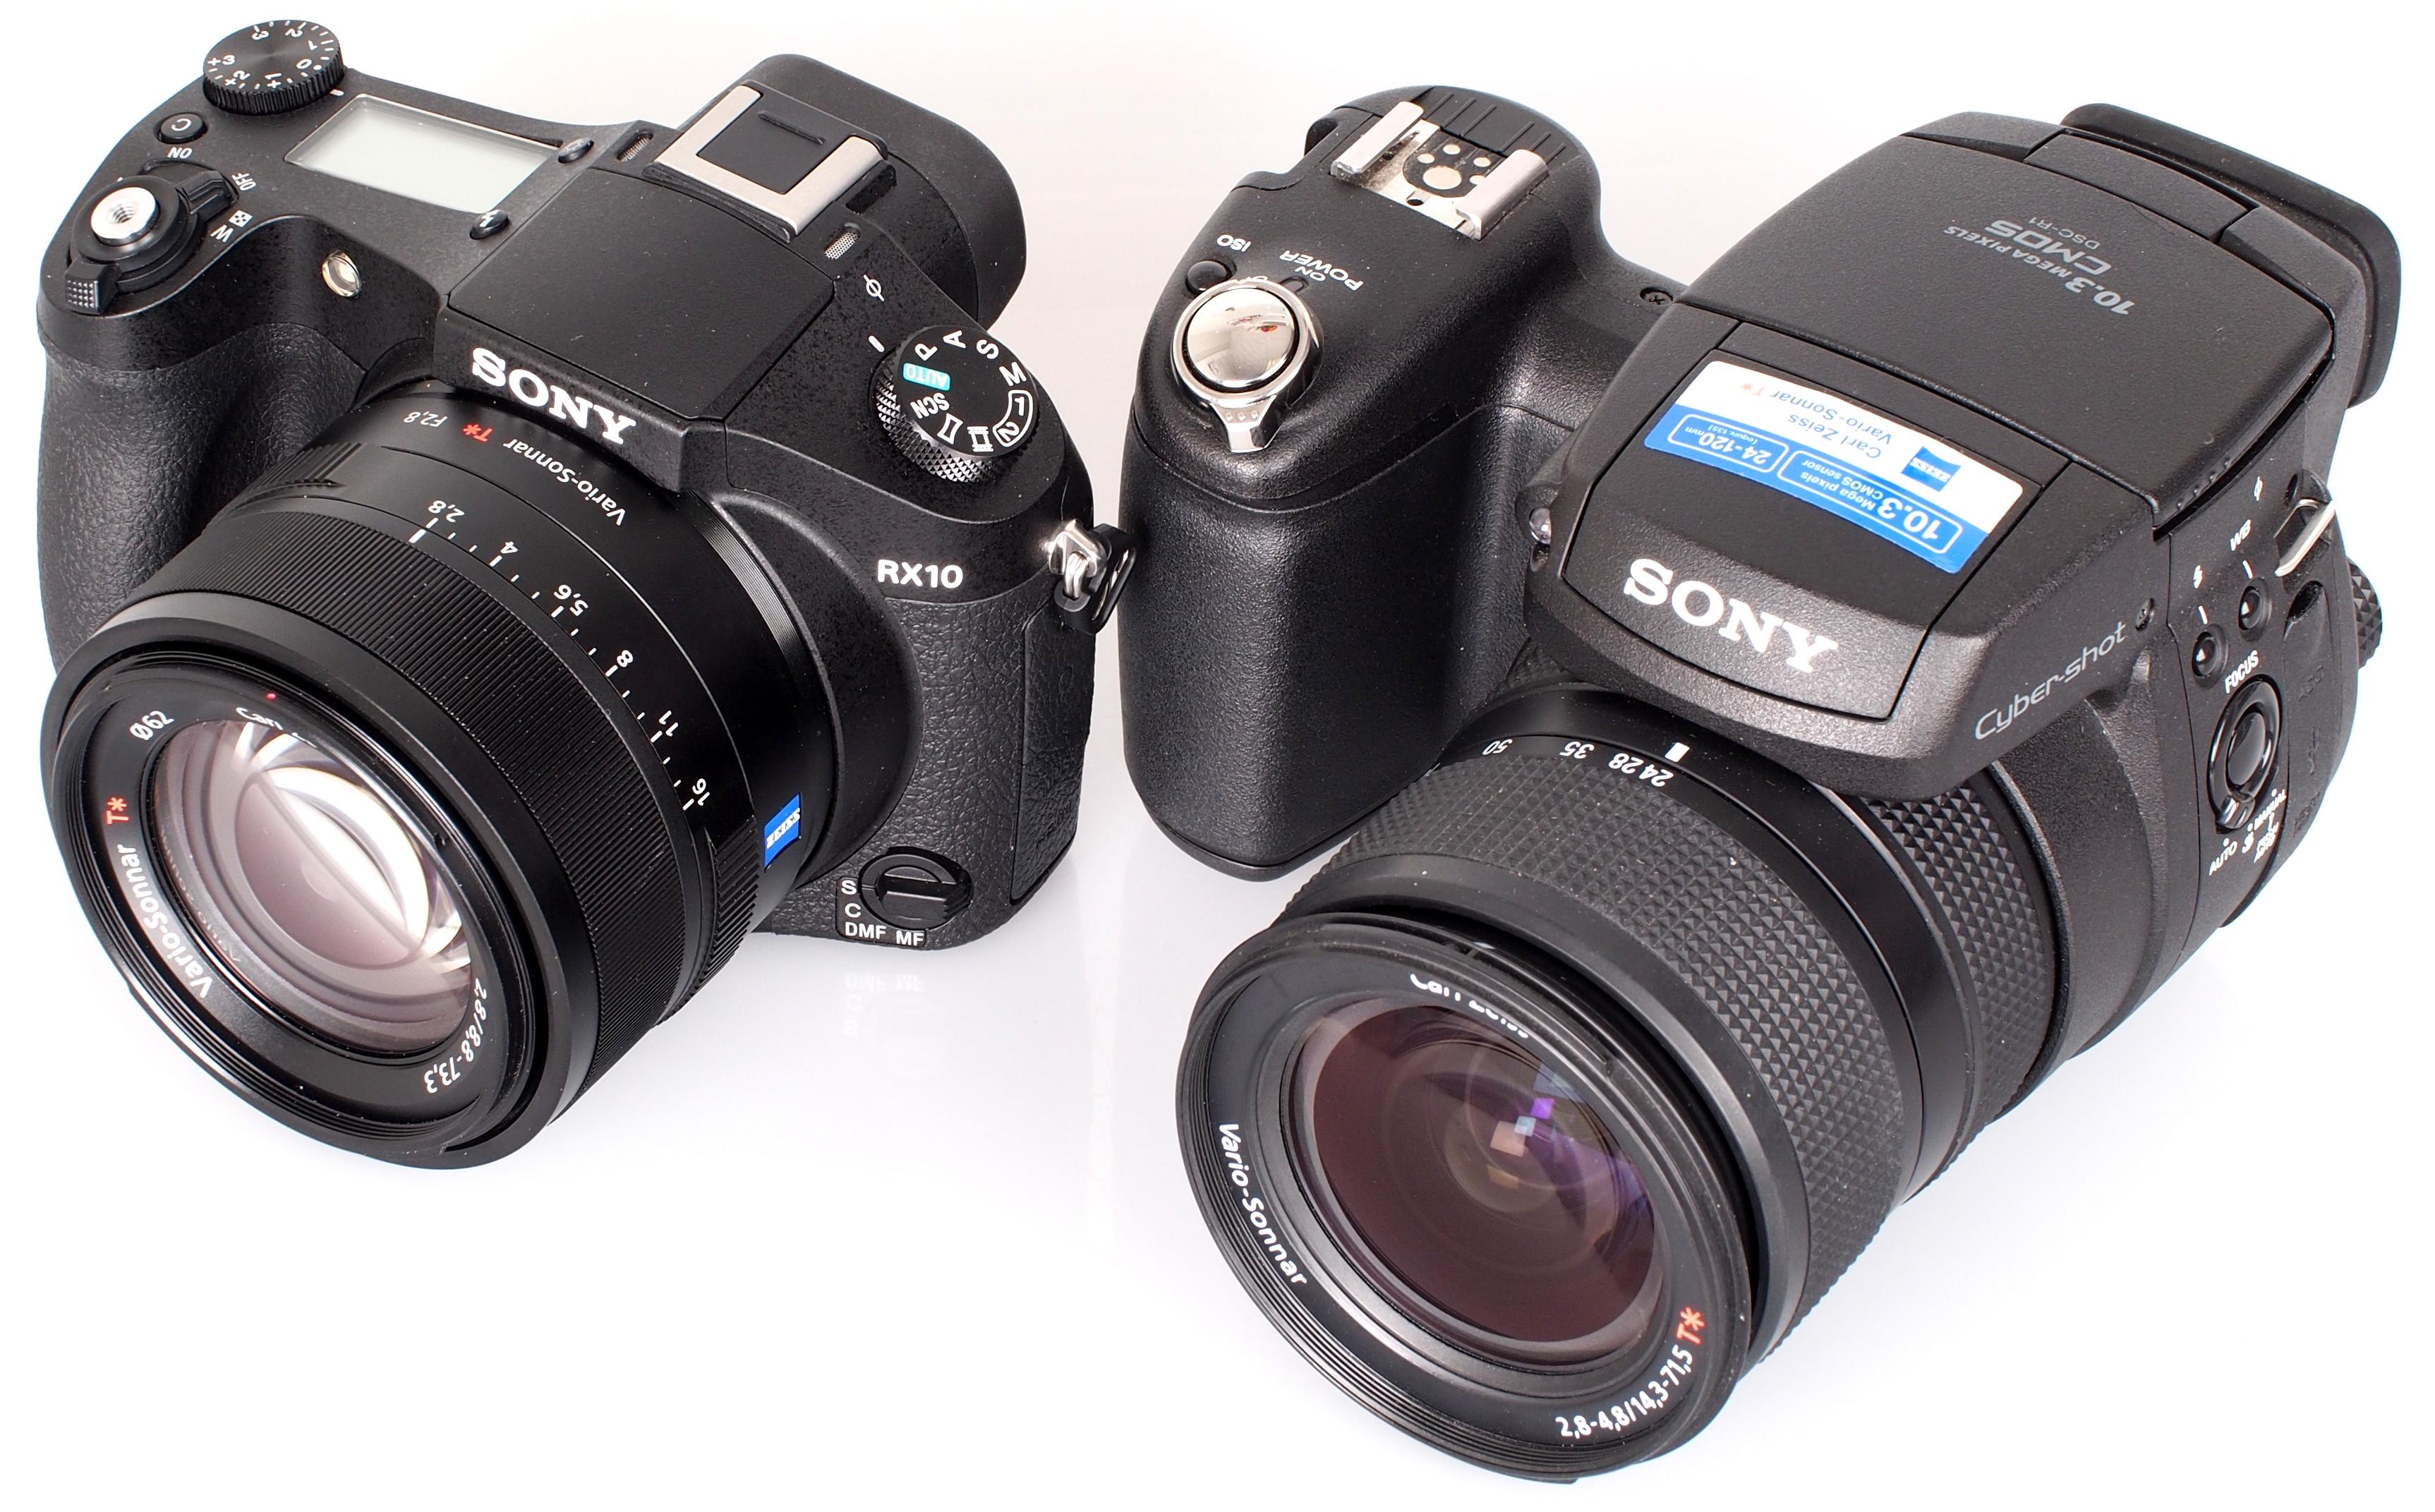 Kindle Vs Sony Reader: Sony Cyber-shot RX10 Vs Sony Cyber-shot R1 Comparison